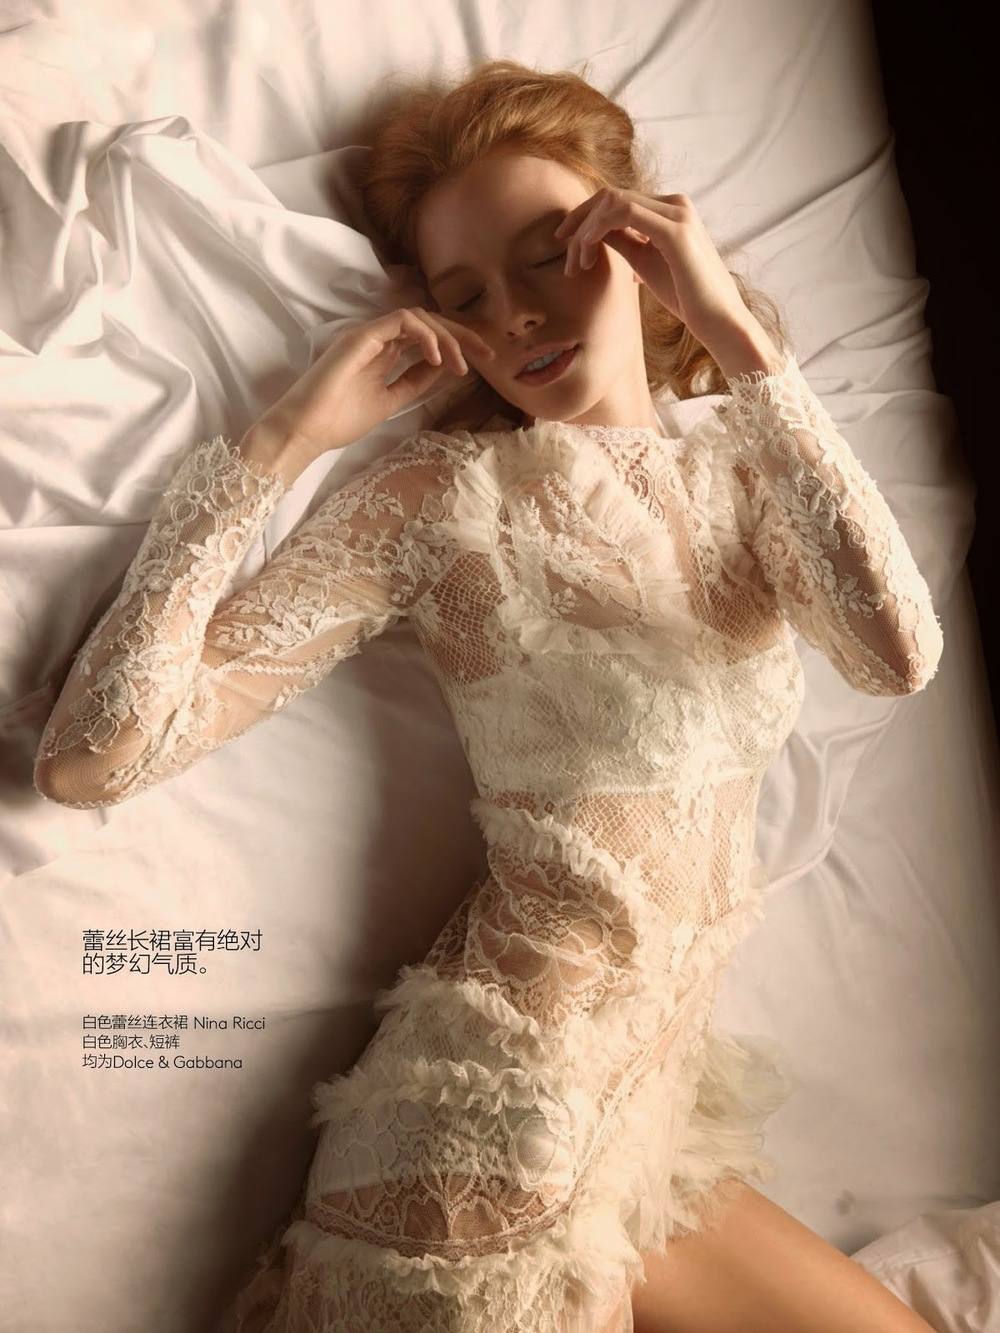 julia-hafstrc3b6m-by-camilla-c3a5krans-for-vogue-china-may-2014-7.jpg